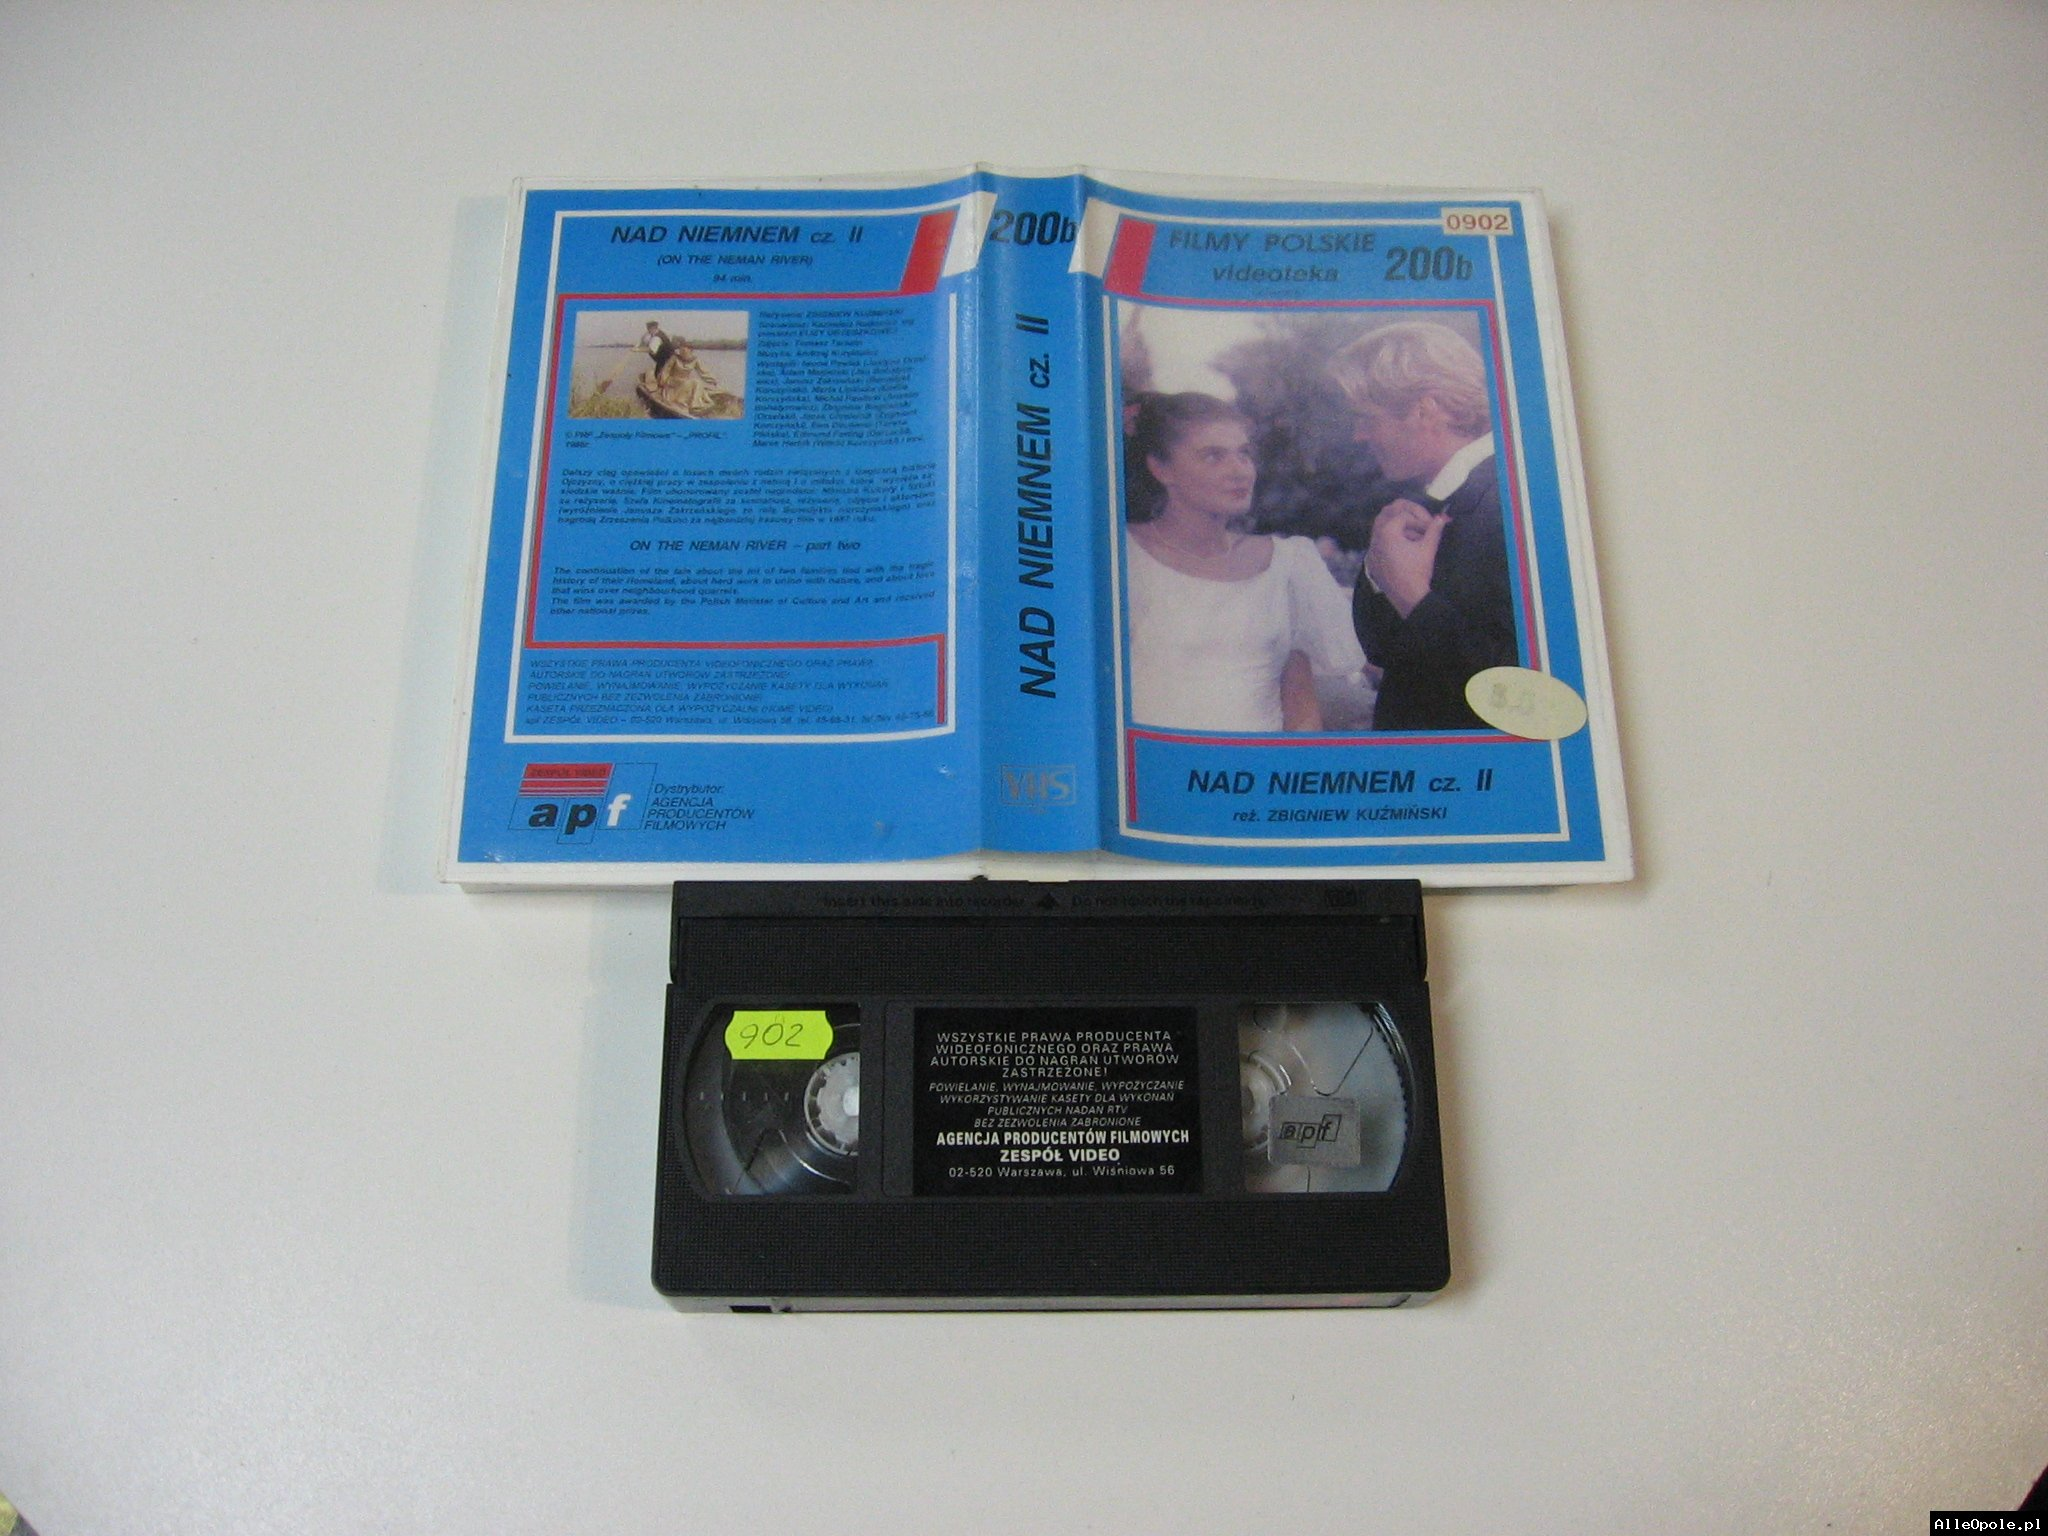 NAD NIEMNEM 2  - VHS Kaseta Video - Opole 1784